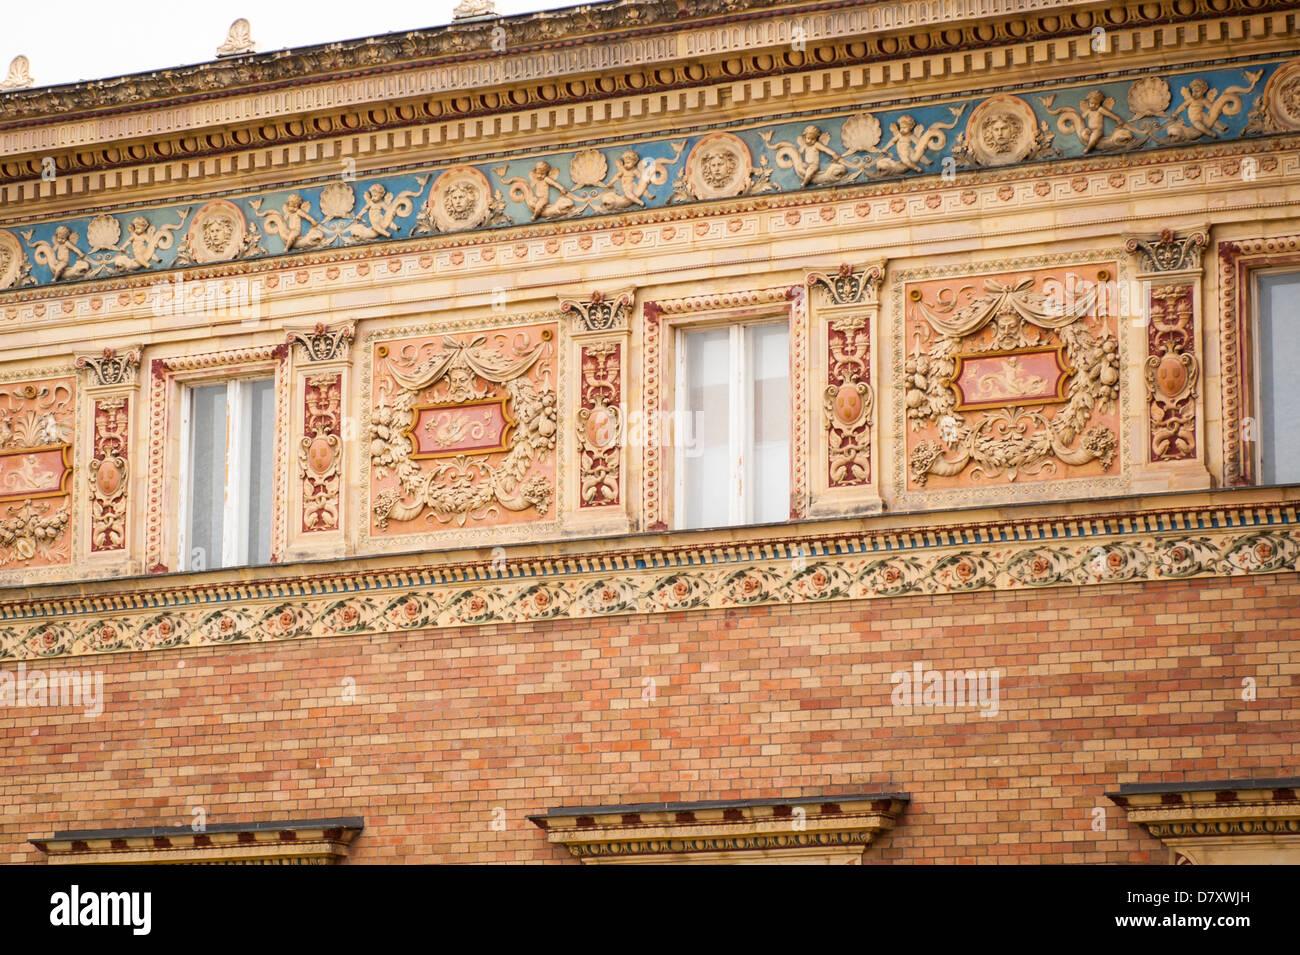 Budapest Hungary Varoliget District 1896 Hero's Milennium Square Mucsarnok Art Gallery ornate wall detail facade Stock Photo